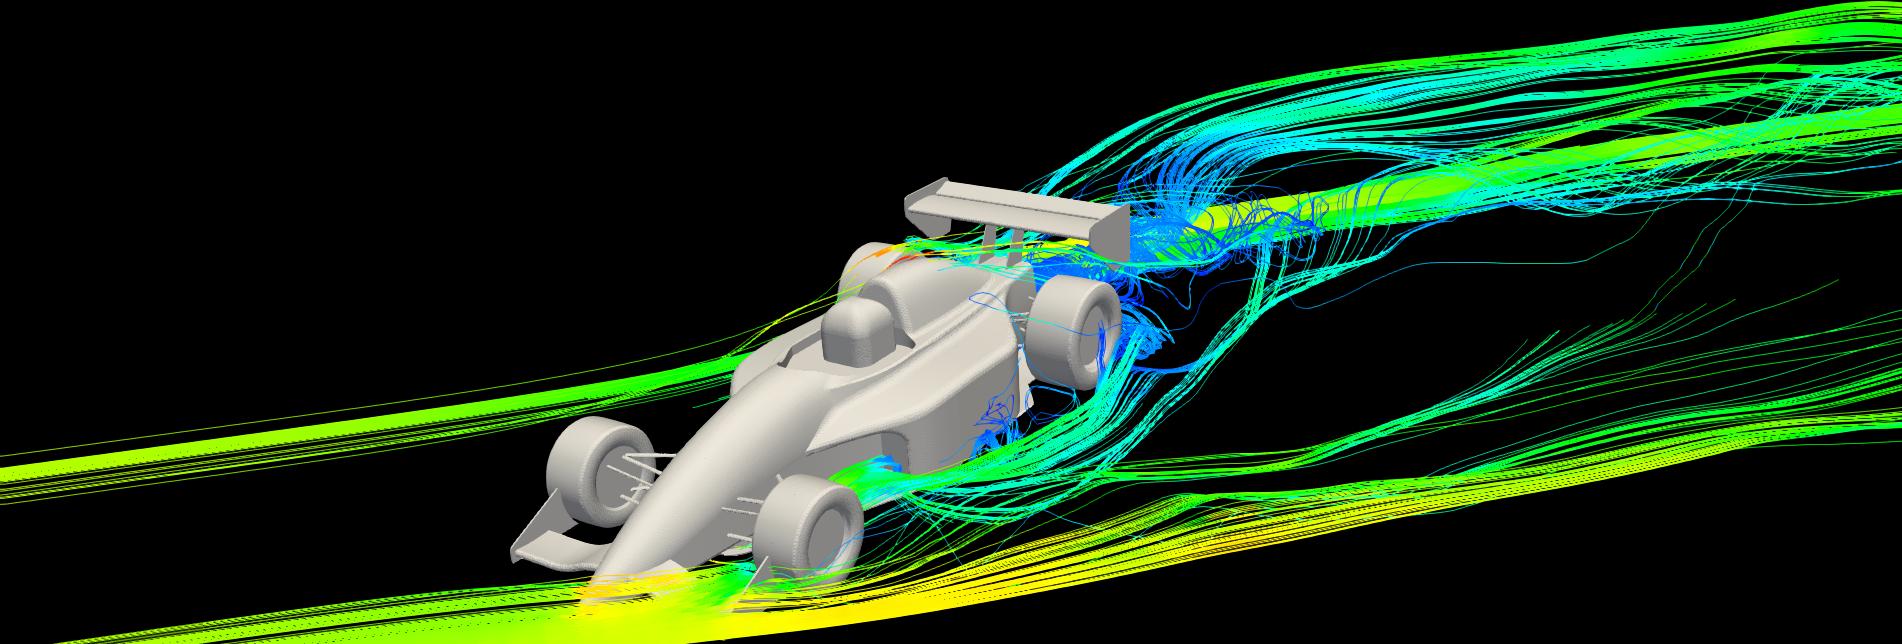 CFD Applications using scFlow